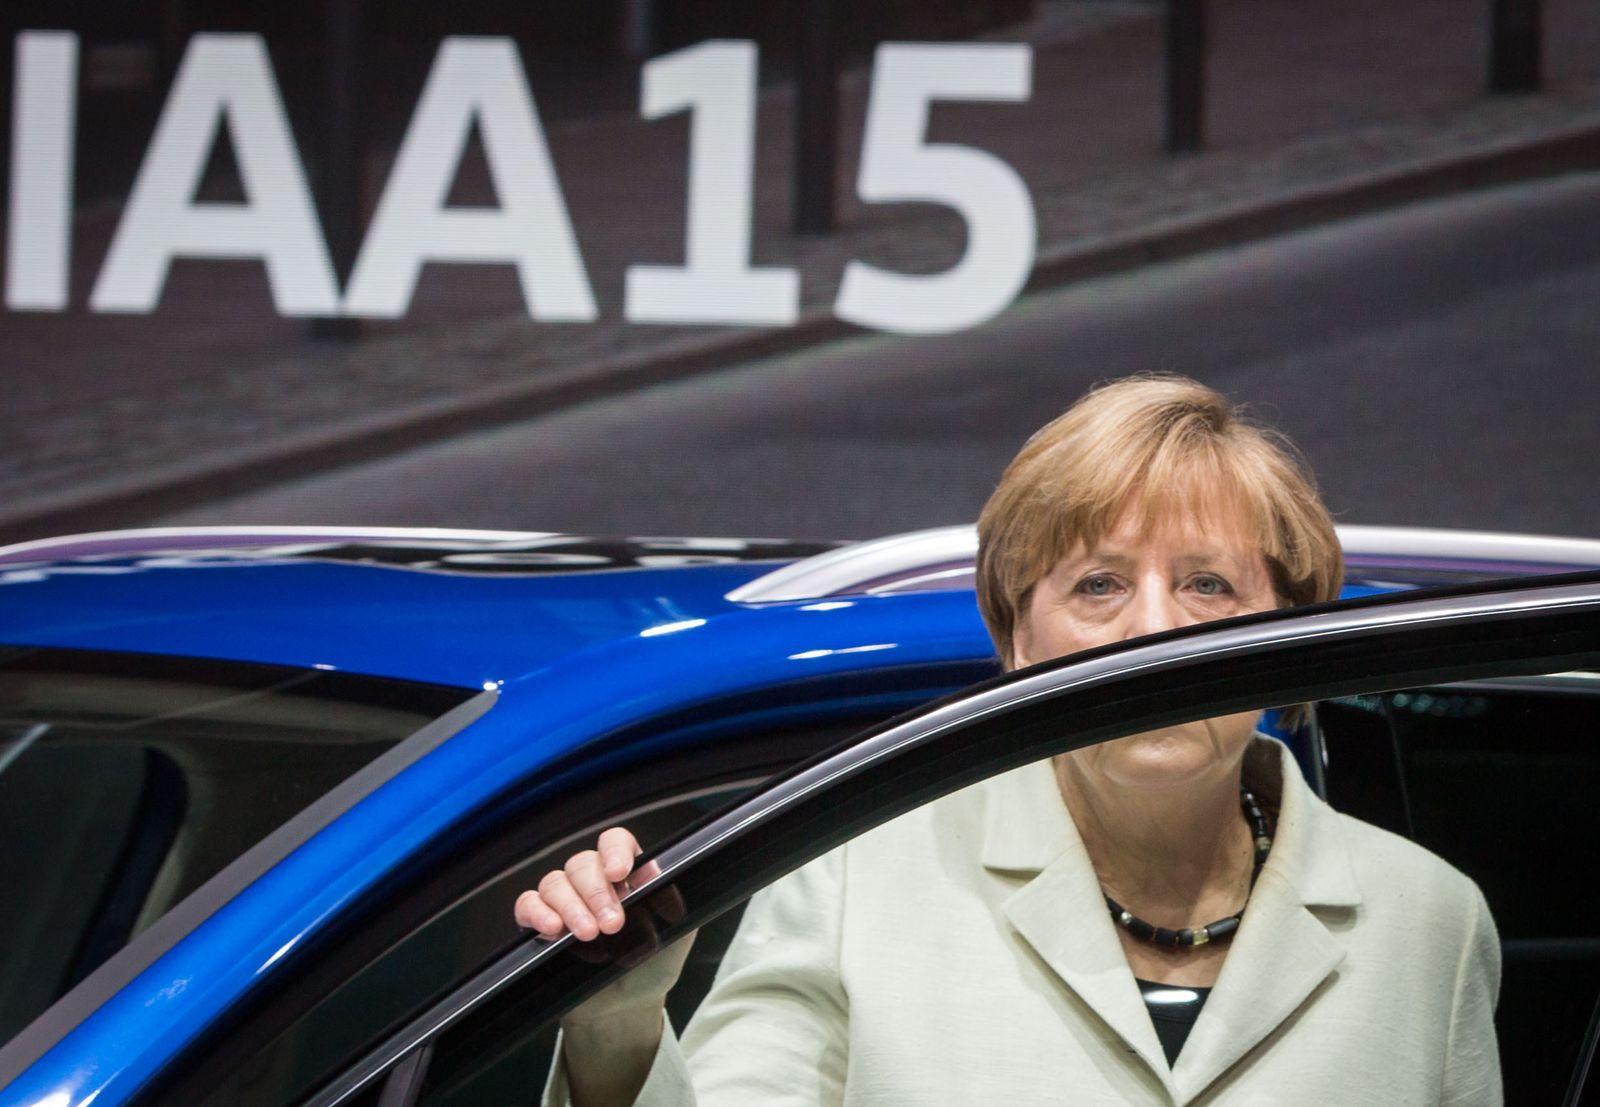 videoteawser IAA - Bundeskanzlerin Angela Merkel